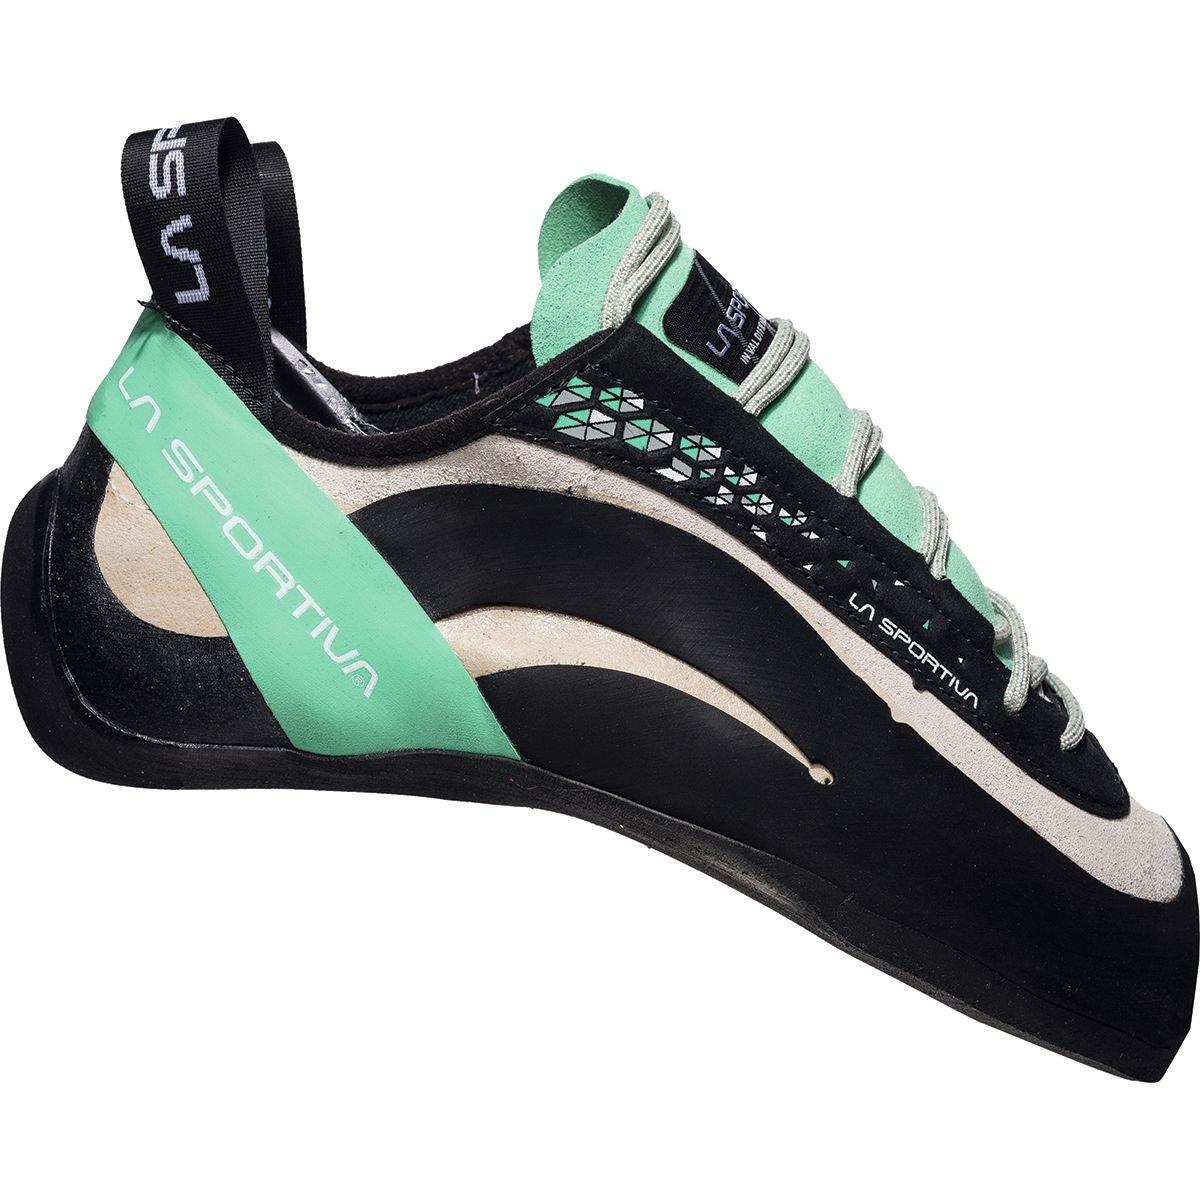 La Sportiva Miura climbing shoe – Women 's 41.5 M EU White/Jade Green B071WP9Y7D